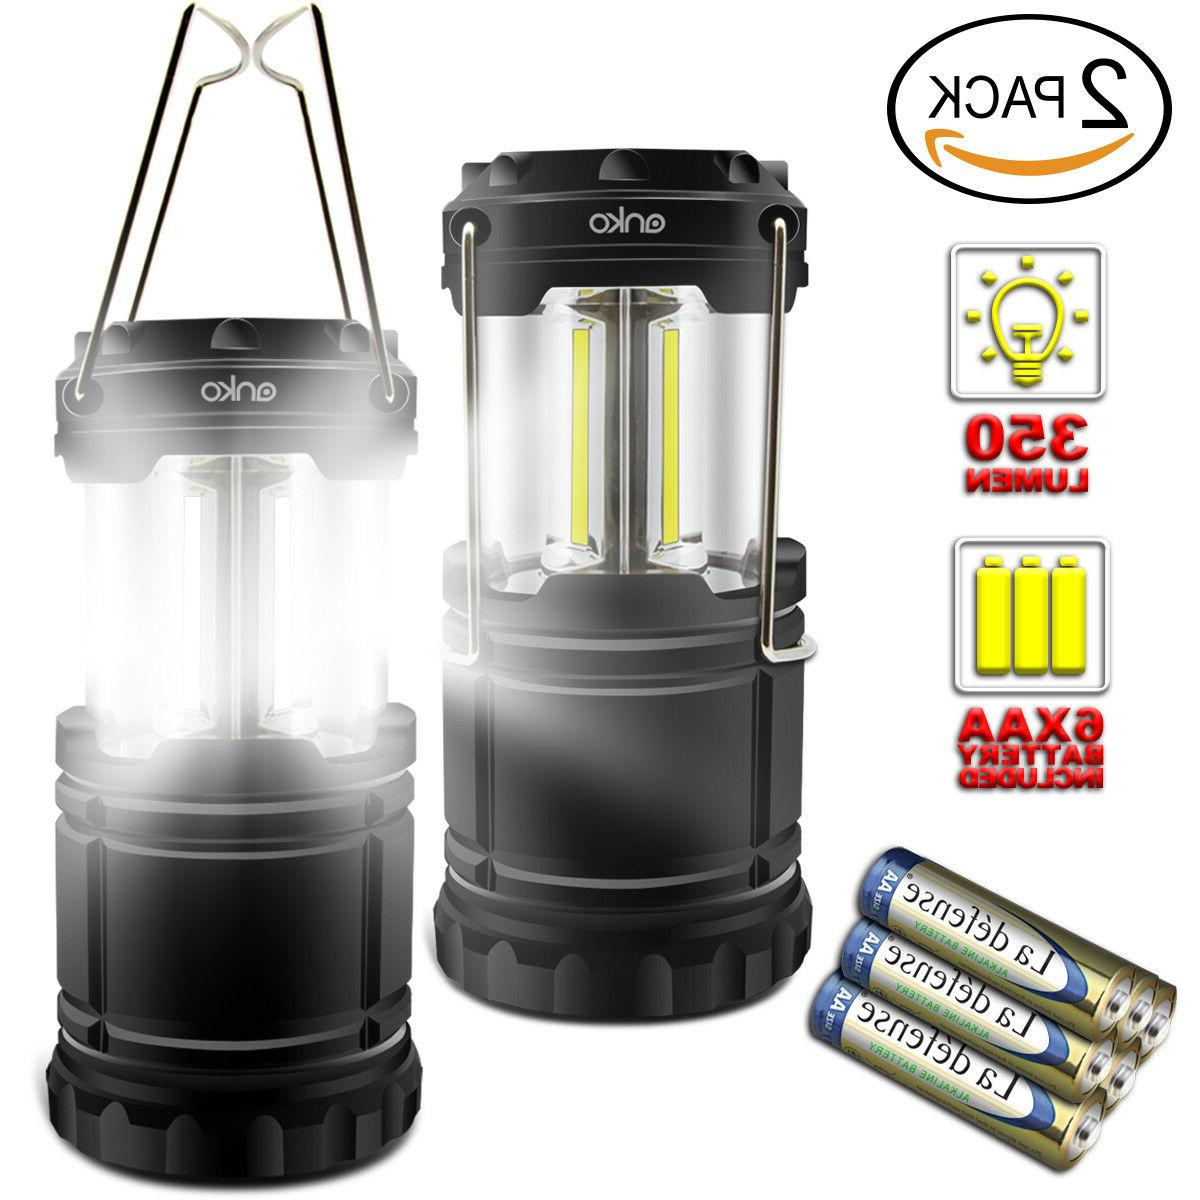 350 lumen cob camping equipment gear lights